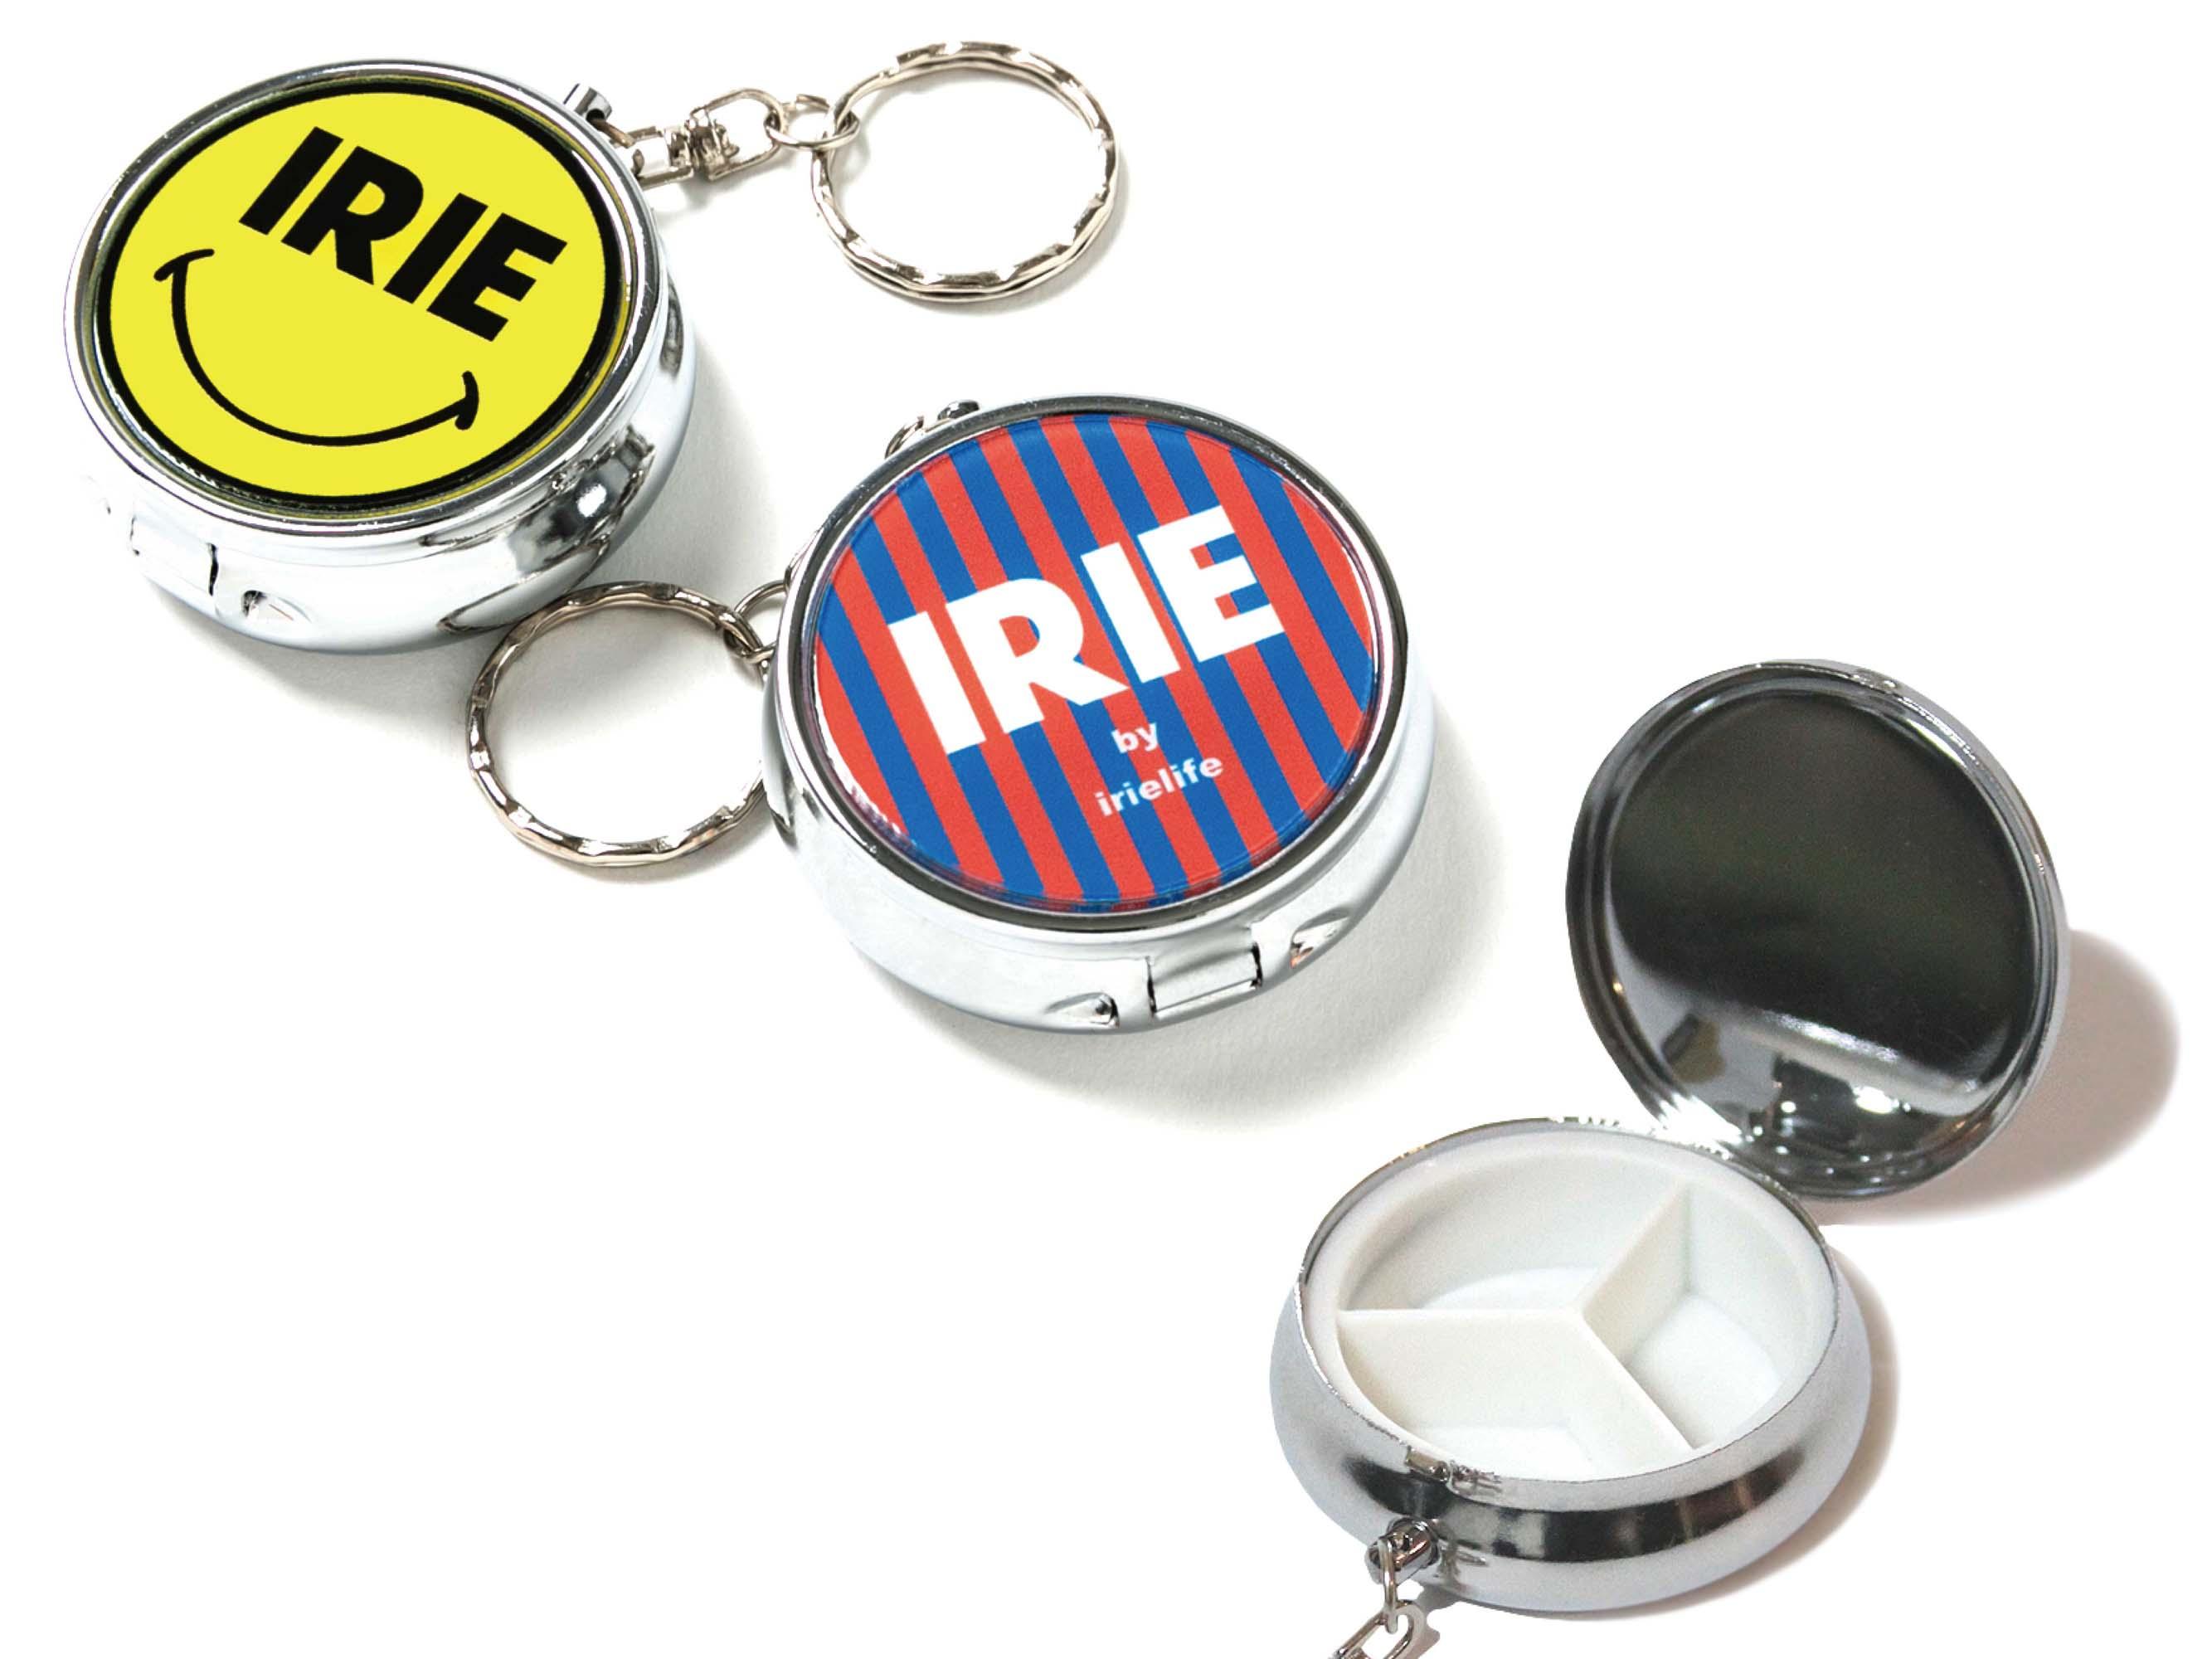 IRIE PILL CASE KEYHOLDER - IRIE by Irielife